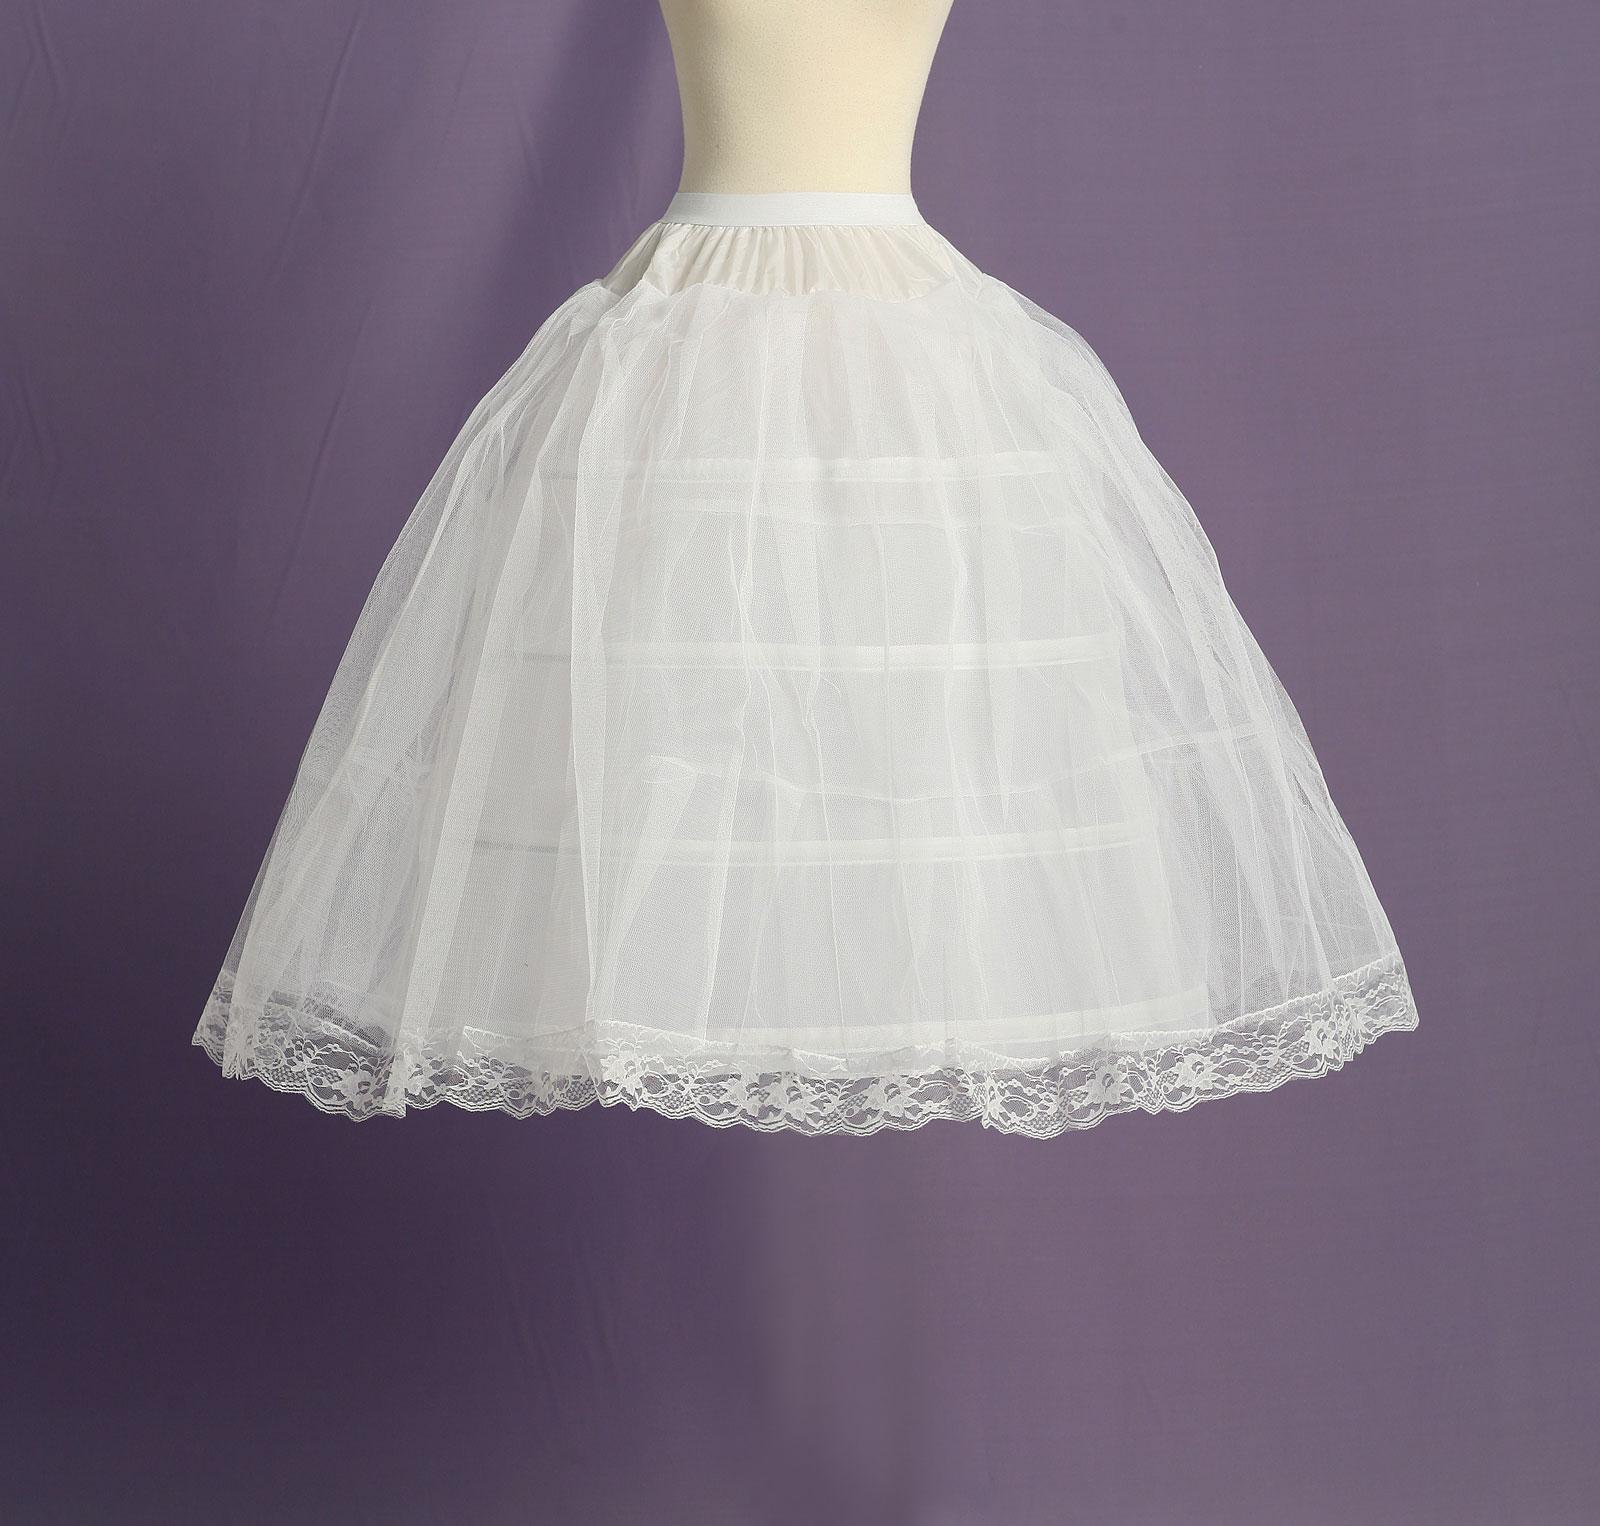 TT P8 4 Woman s Adult Petticoat Petticoats Flower Girl Dresses Fl